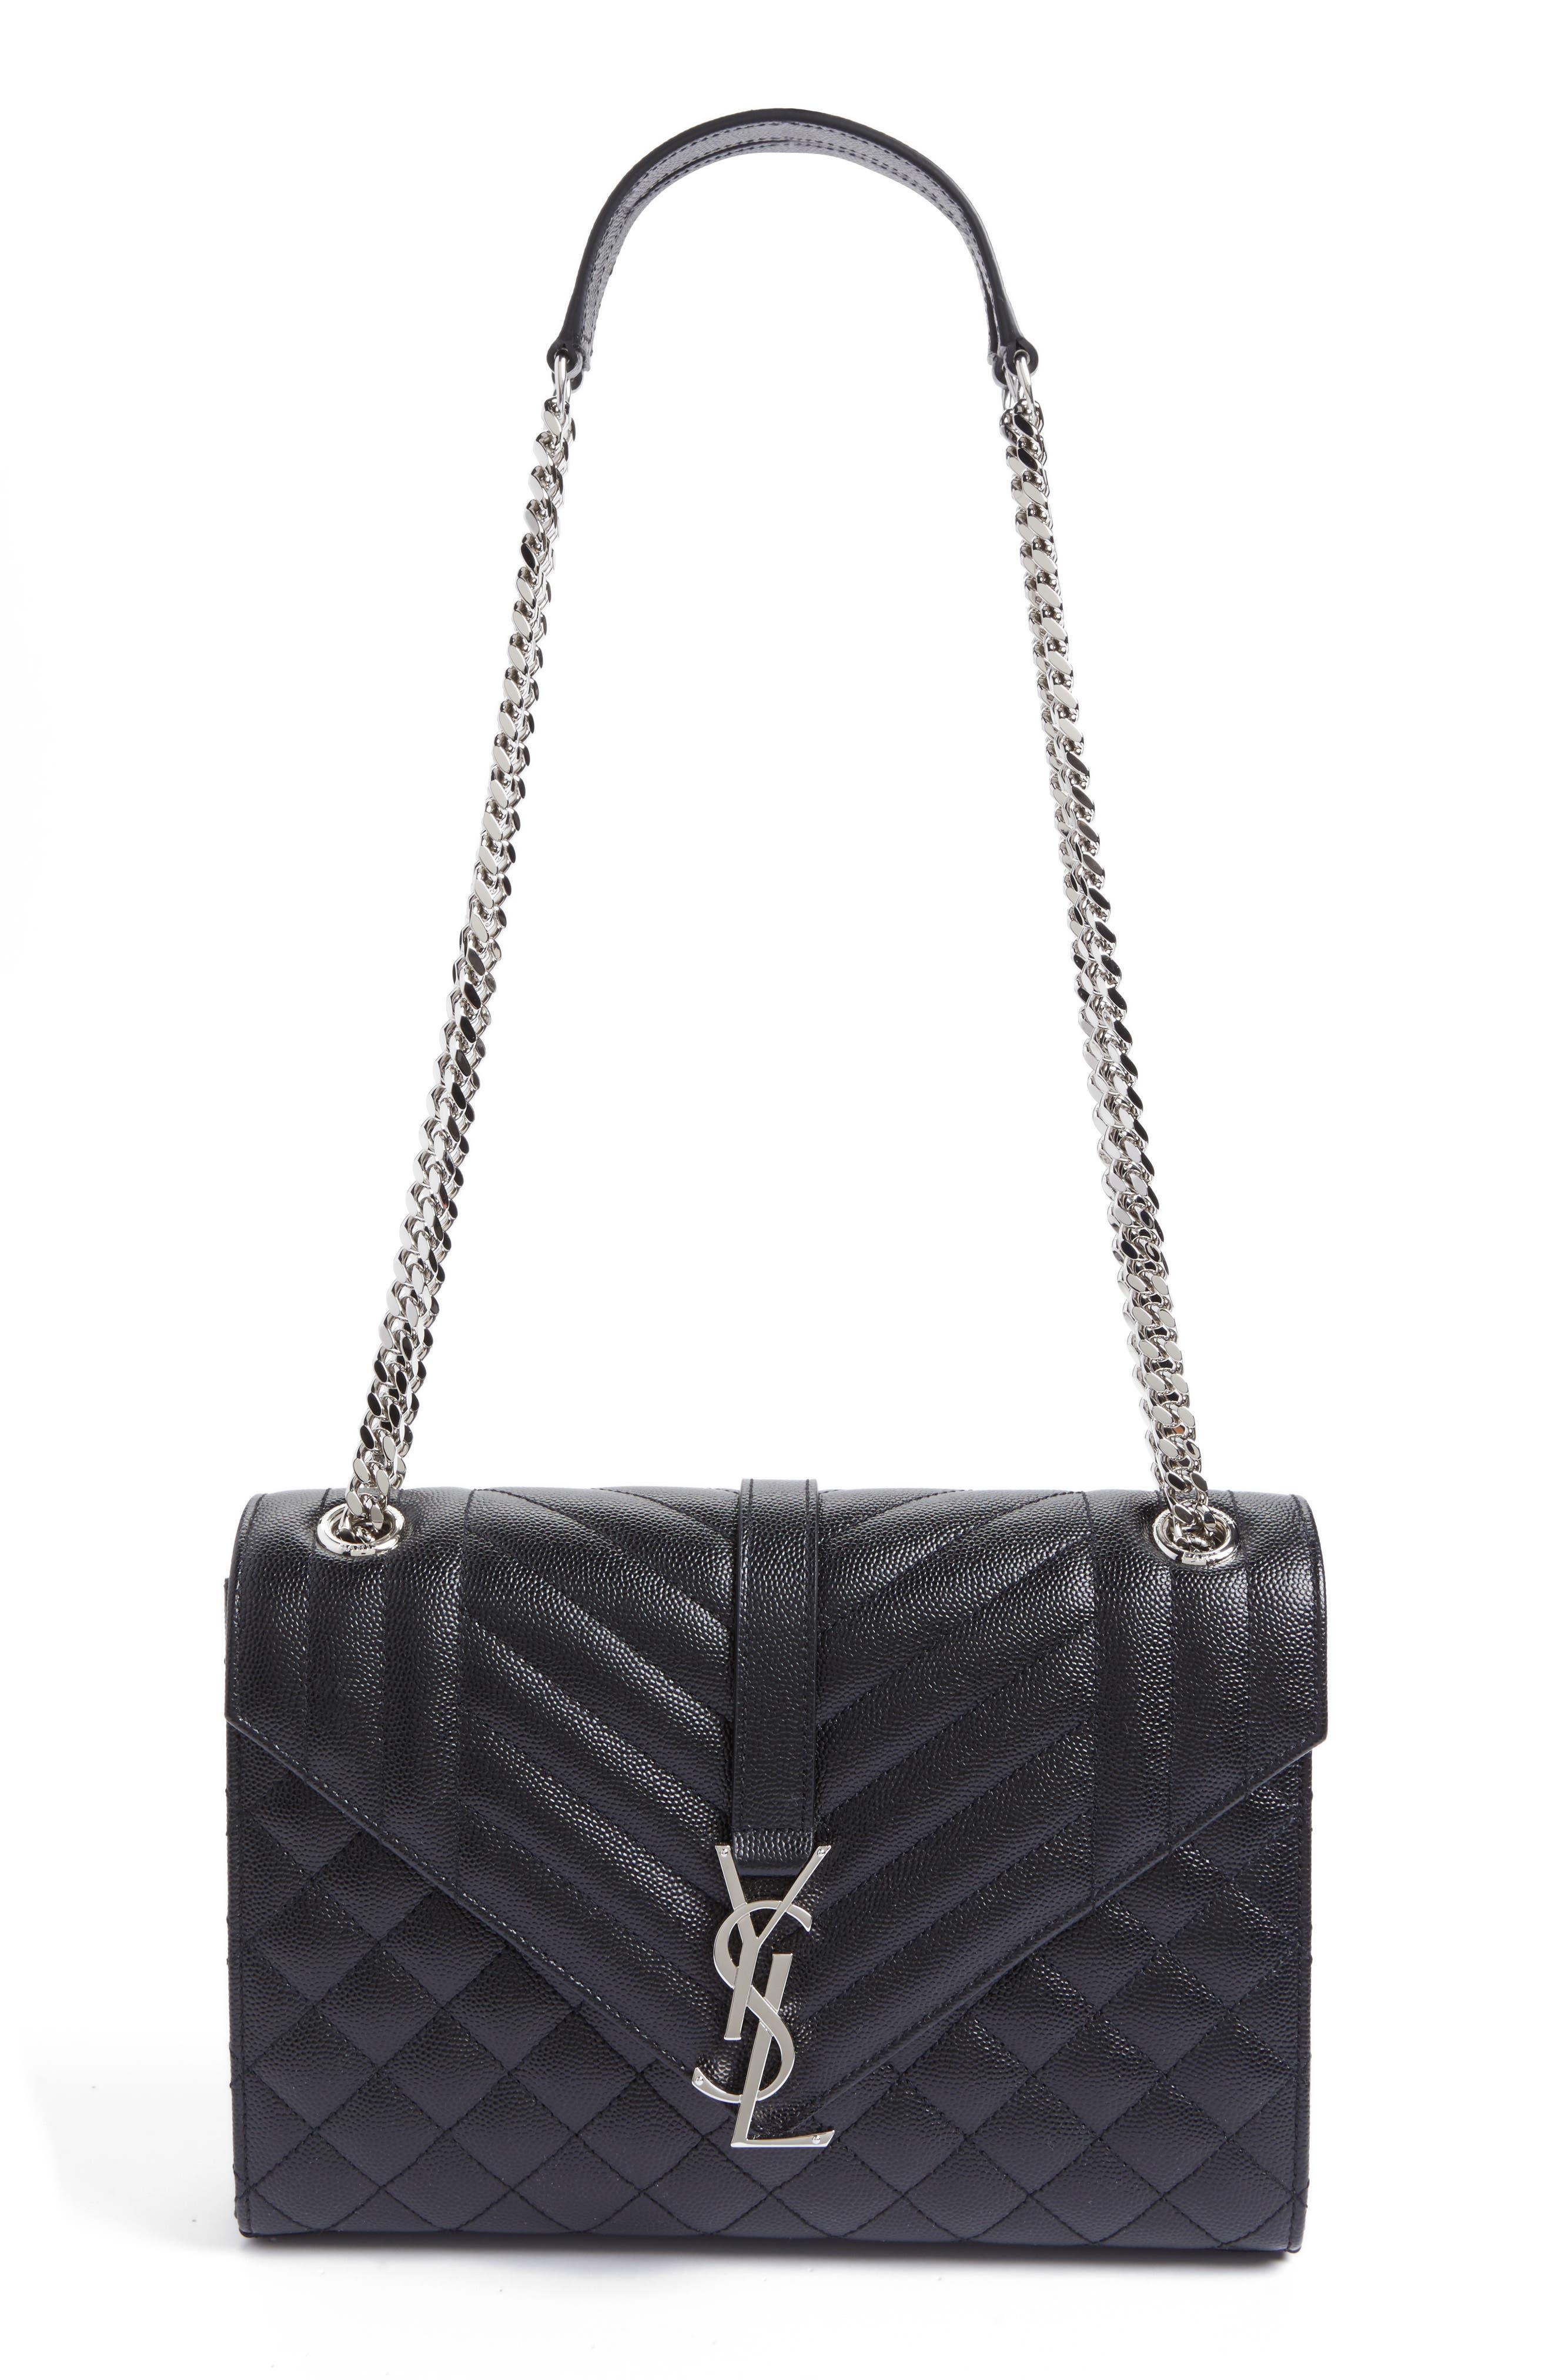 SAINT LAURENT Large Monogram Quilted Leather Shoulder Bag, Main, color, NERO